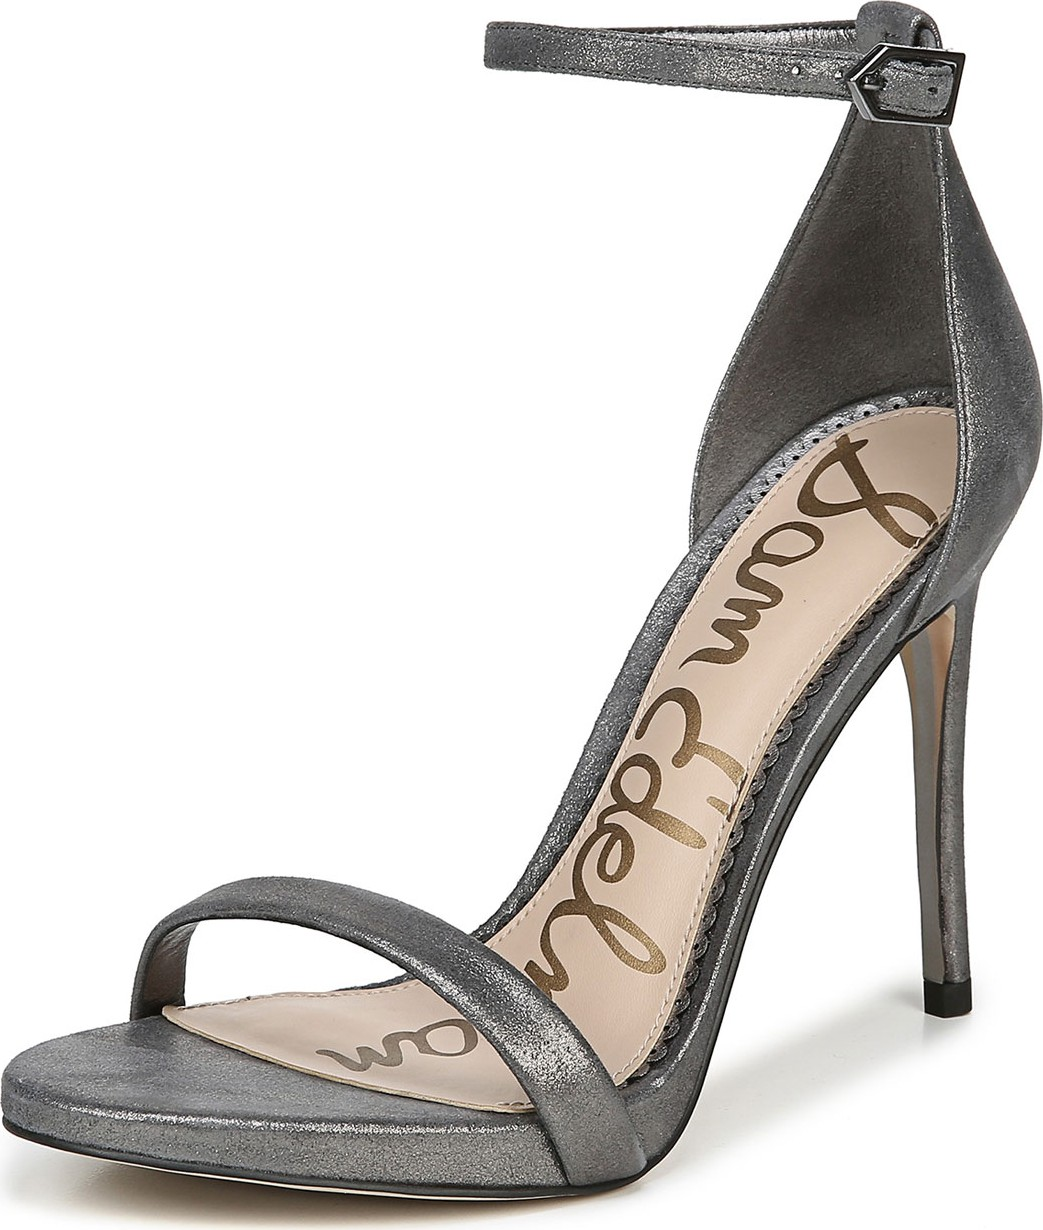 8d8c8483ed3 Sam Edelman Ariella Metallic Leather Sandals - Mkt